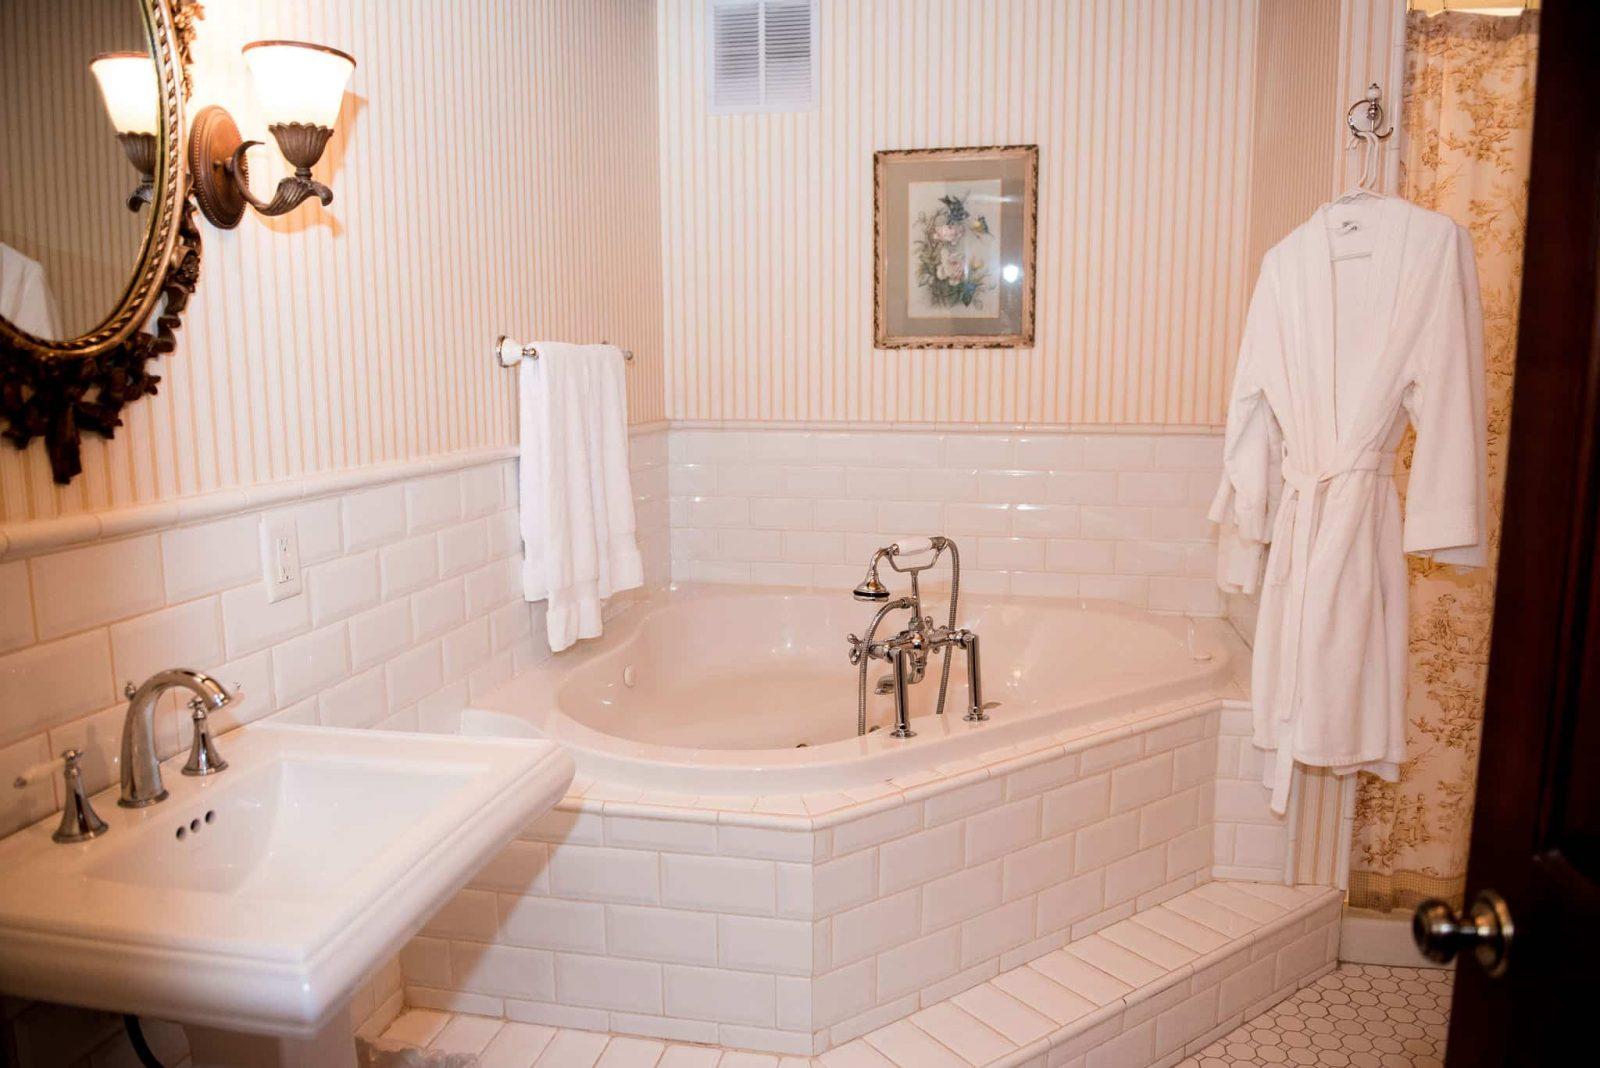 Room 23 bathroom interior facing the whirlpool tub